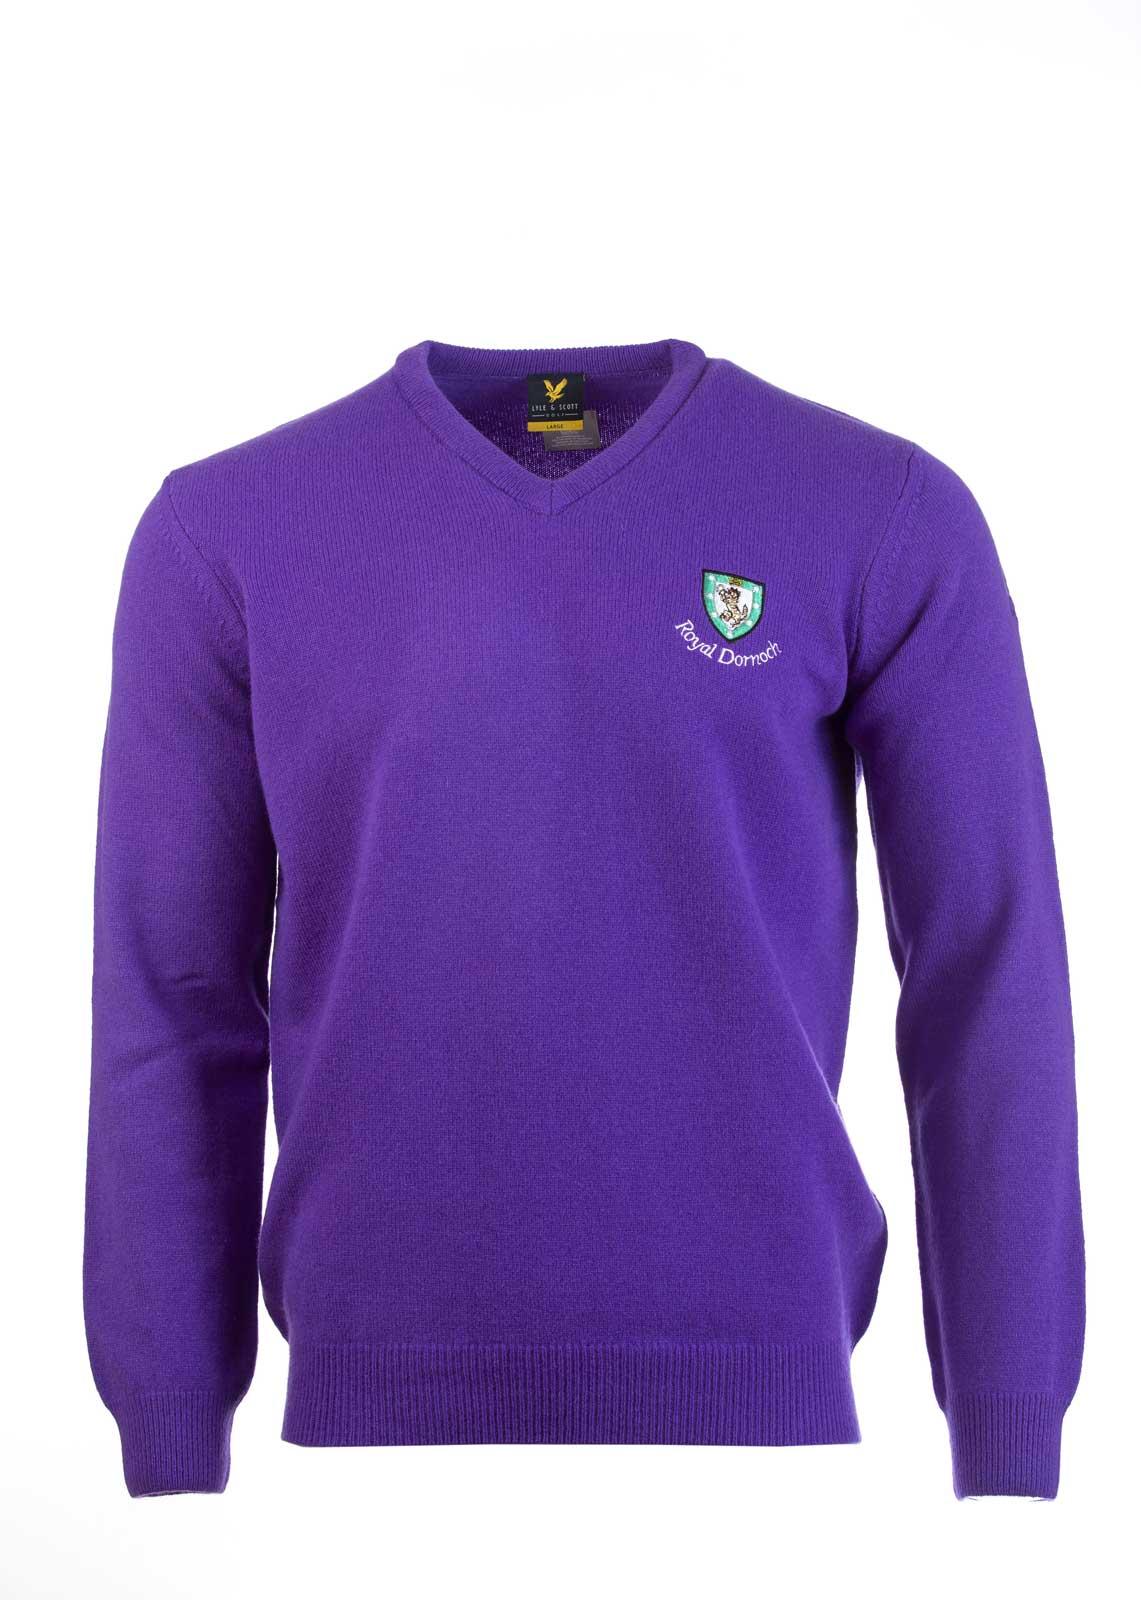 Lyle Amp Scott Classic V Neck Sweater Royal Dornoch Pro Shop